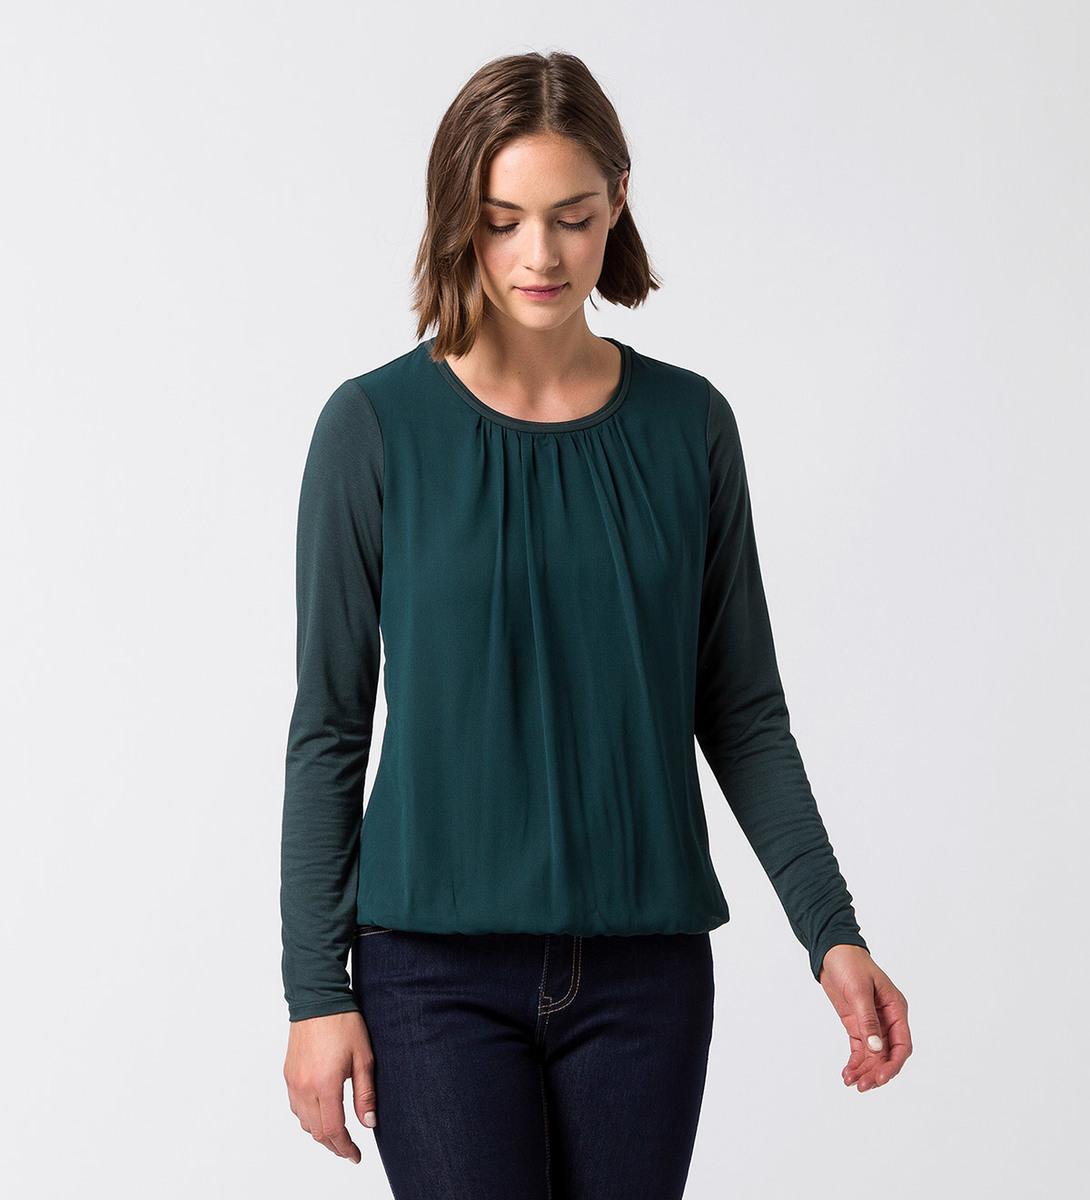 Blusenshirt Selma in deep green